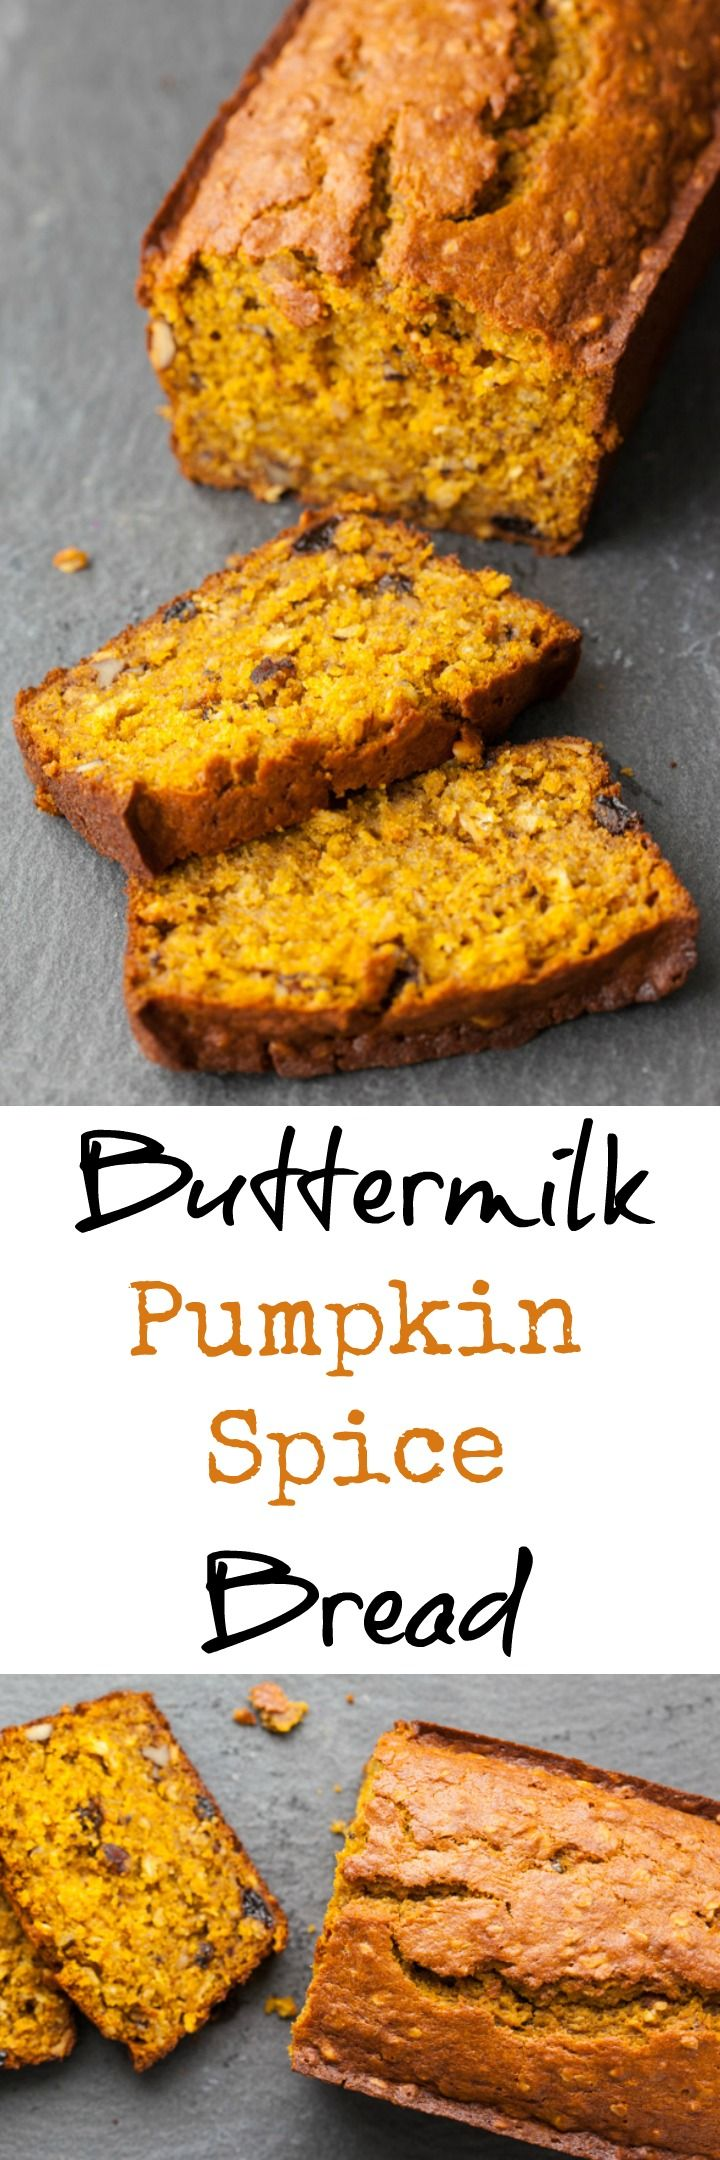 Buttermilk Pumpkin Spice Bread Recipe Pumpkin Spice Bread Food Pumpkin Recipes